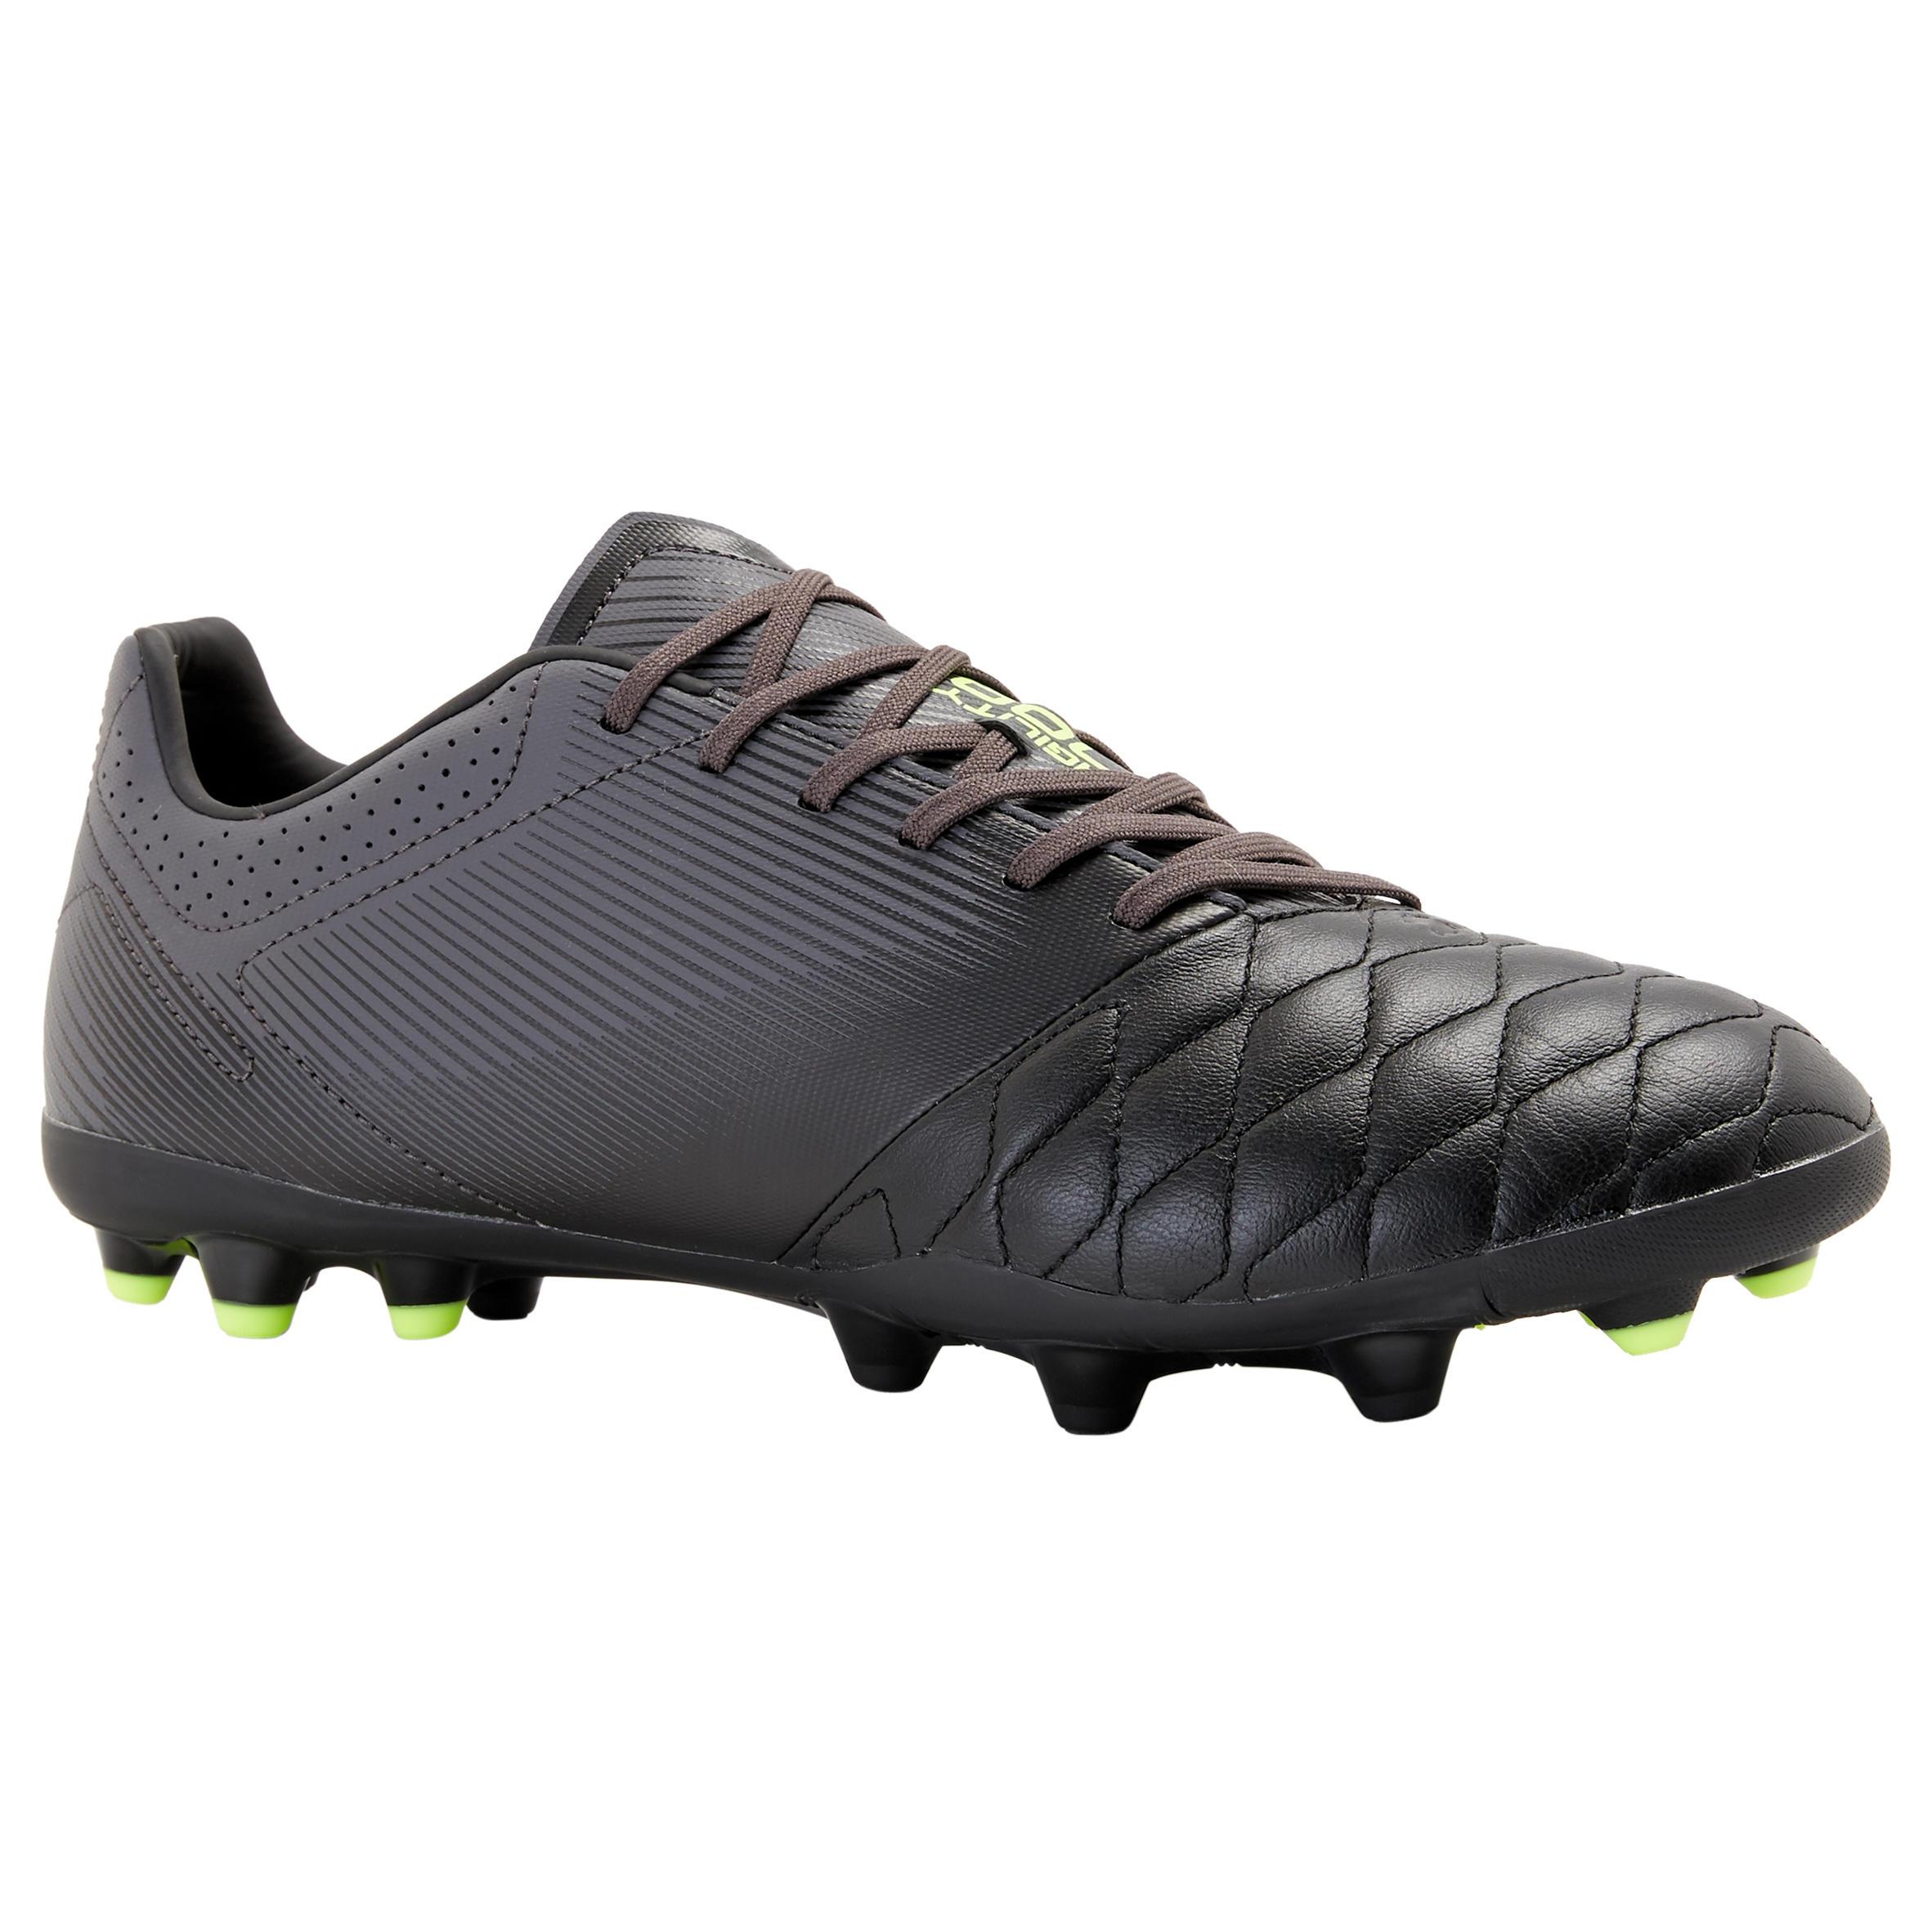 Football Shoes Hong Kong   Soccer Boots